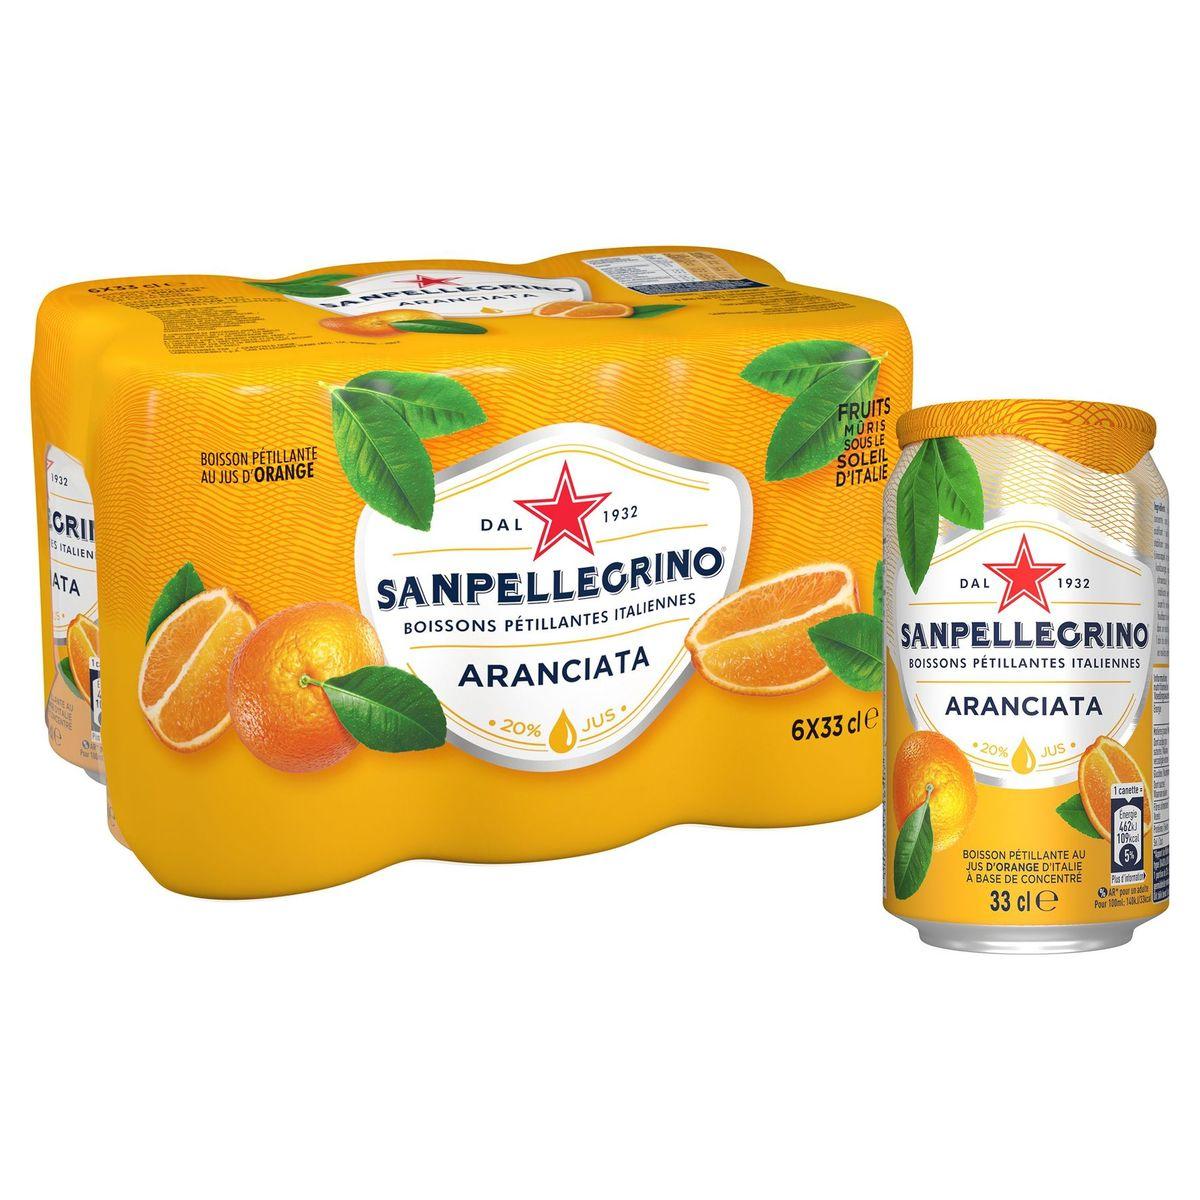 SANPELLEGRINO® Aranciata Bruisende Vruchtendrank Blikje 6 x 33 cl